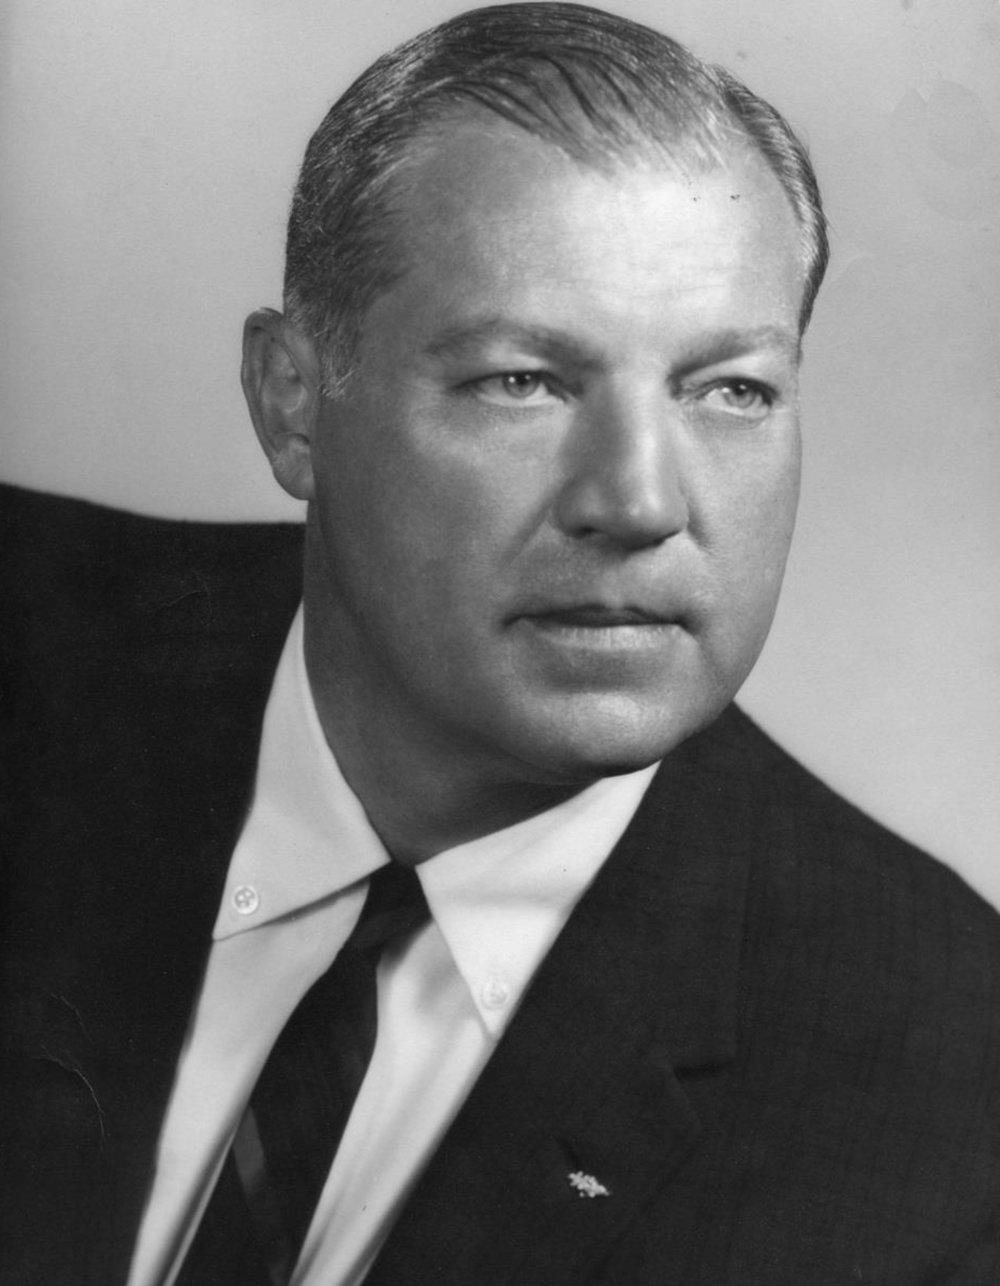 EDWARD C. ELLET, SR.